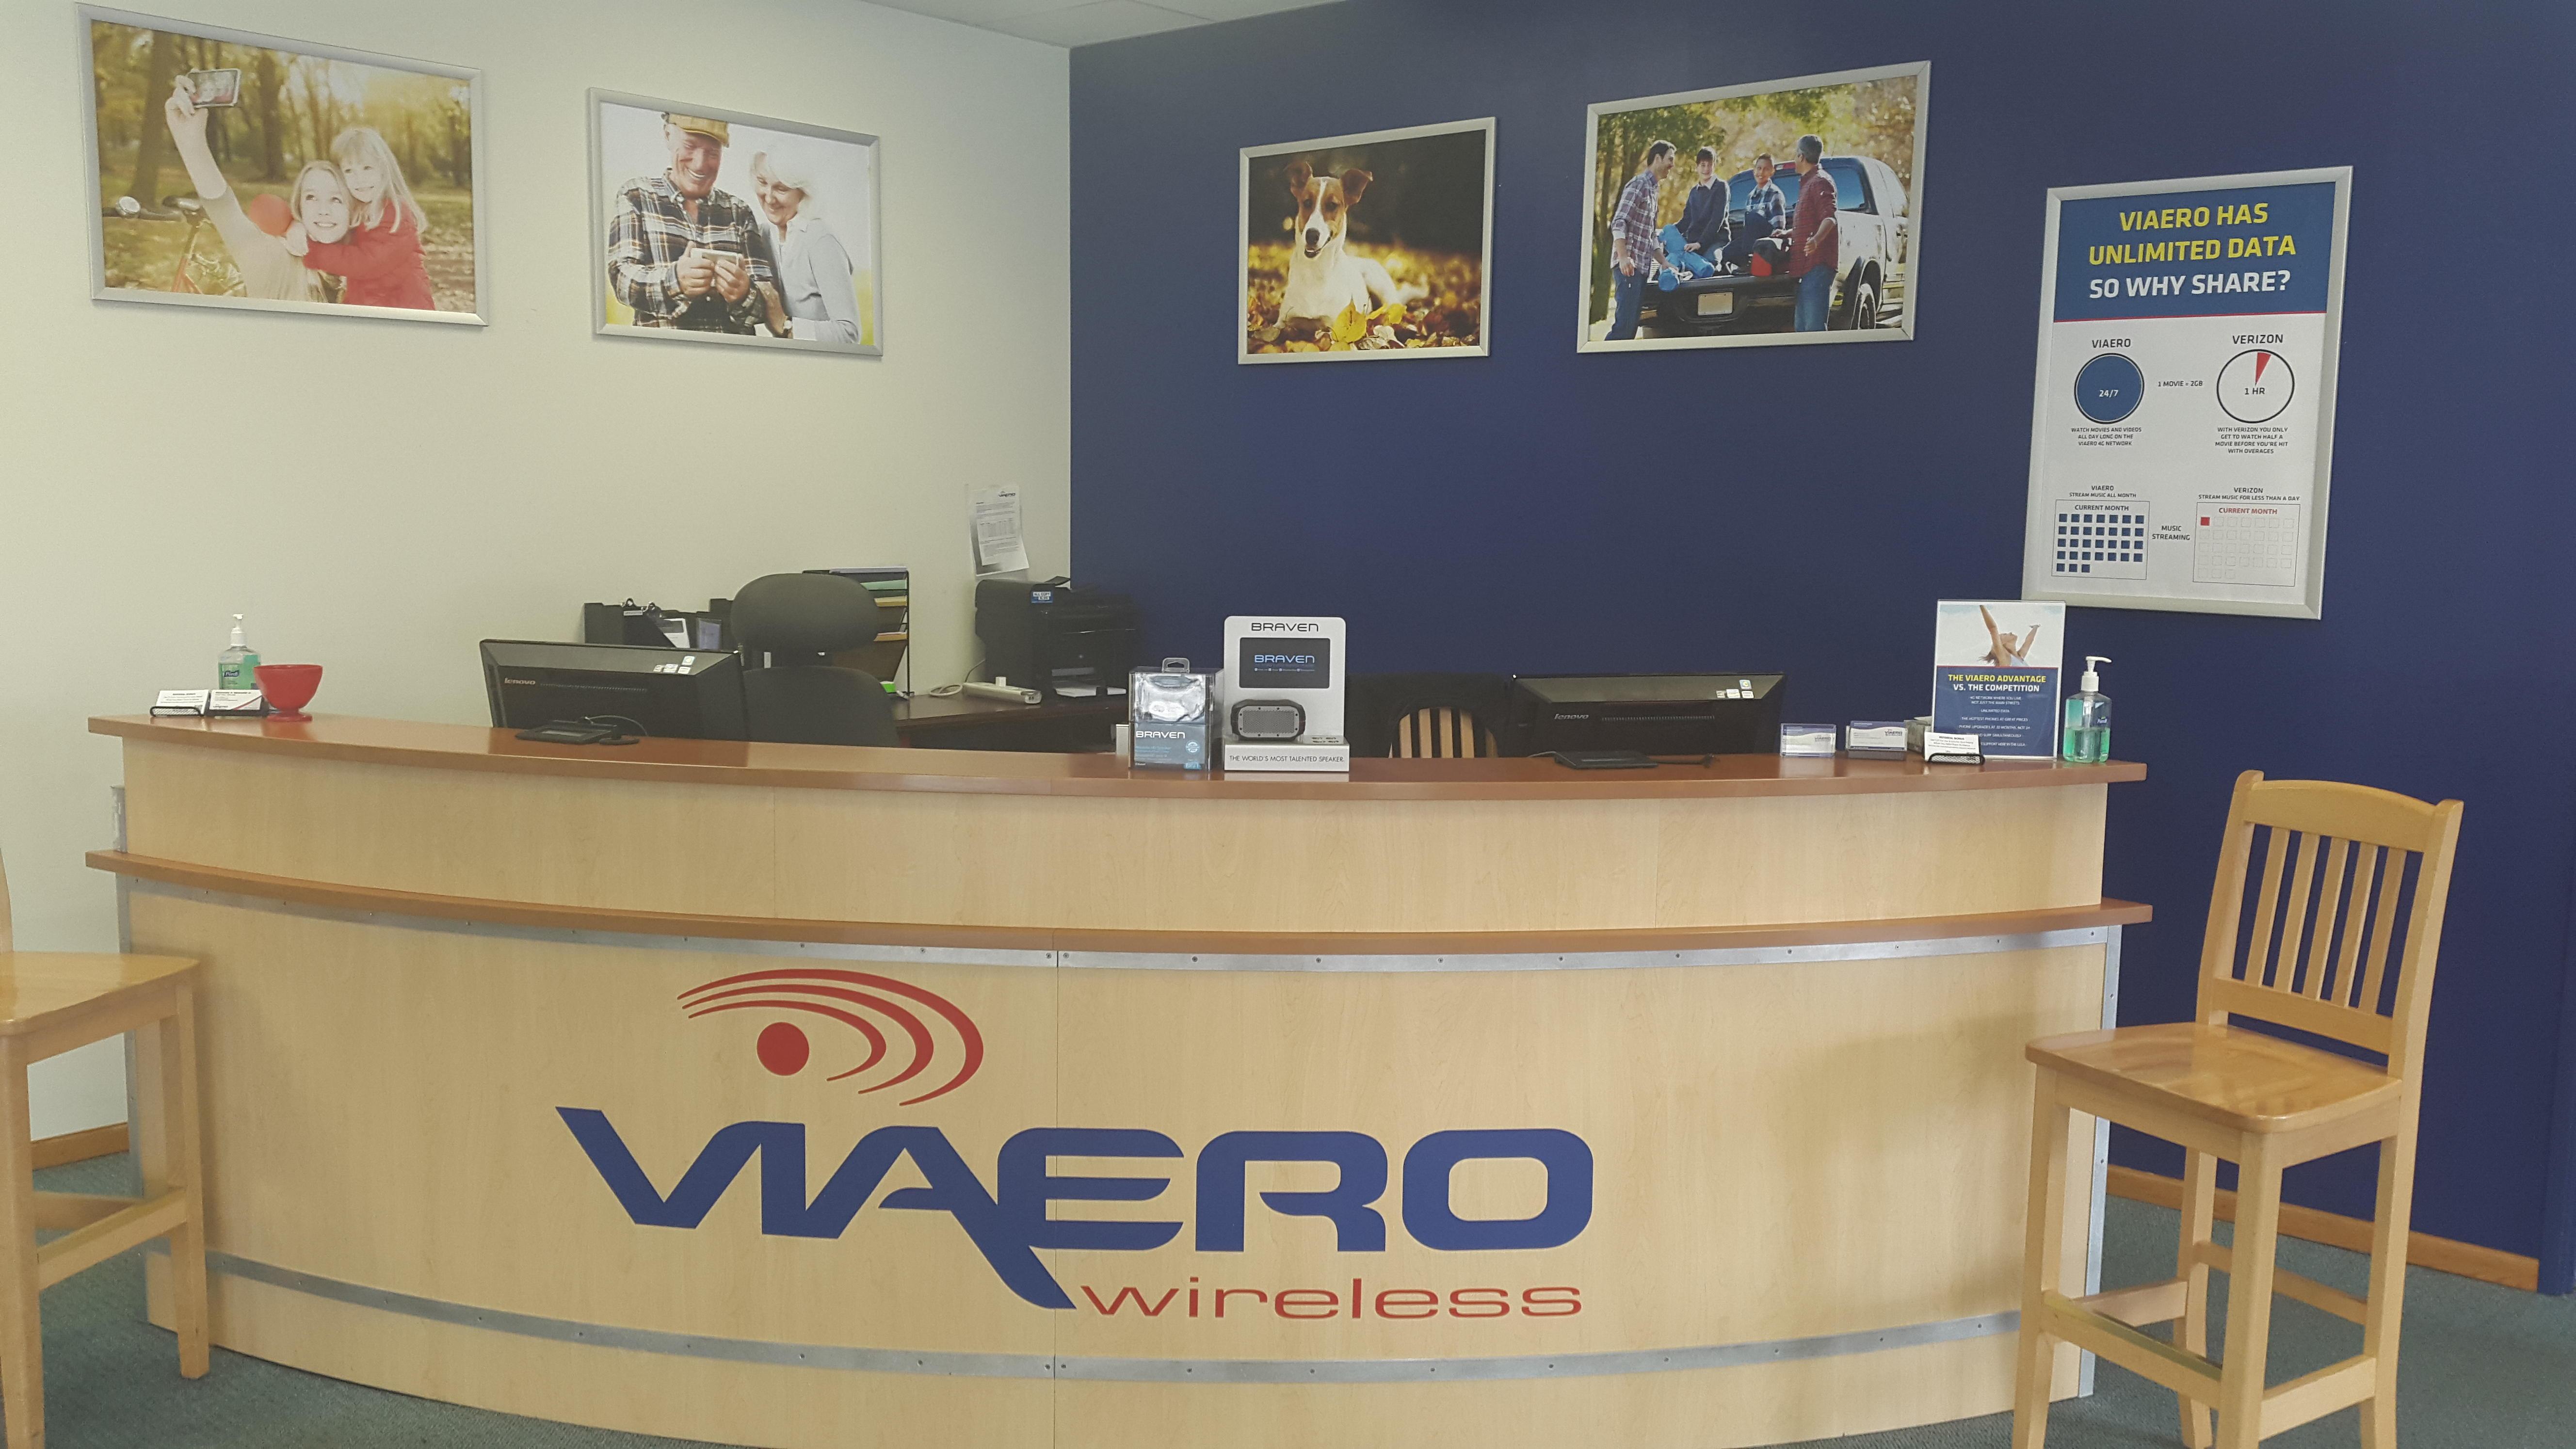 Viaero Wireless image 2